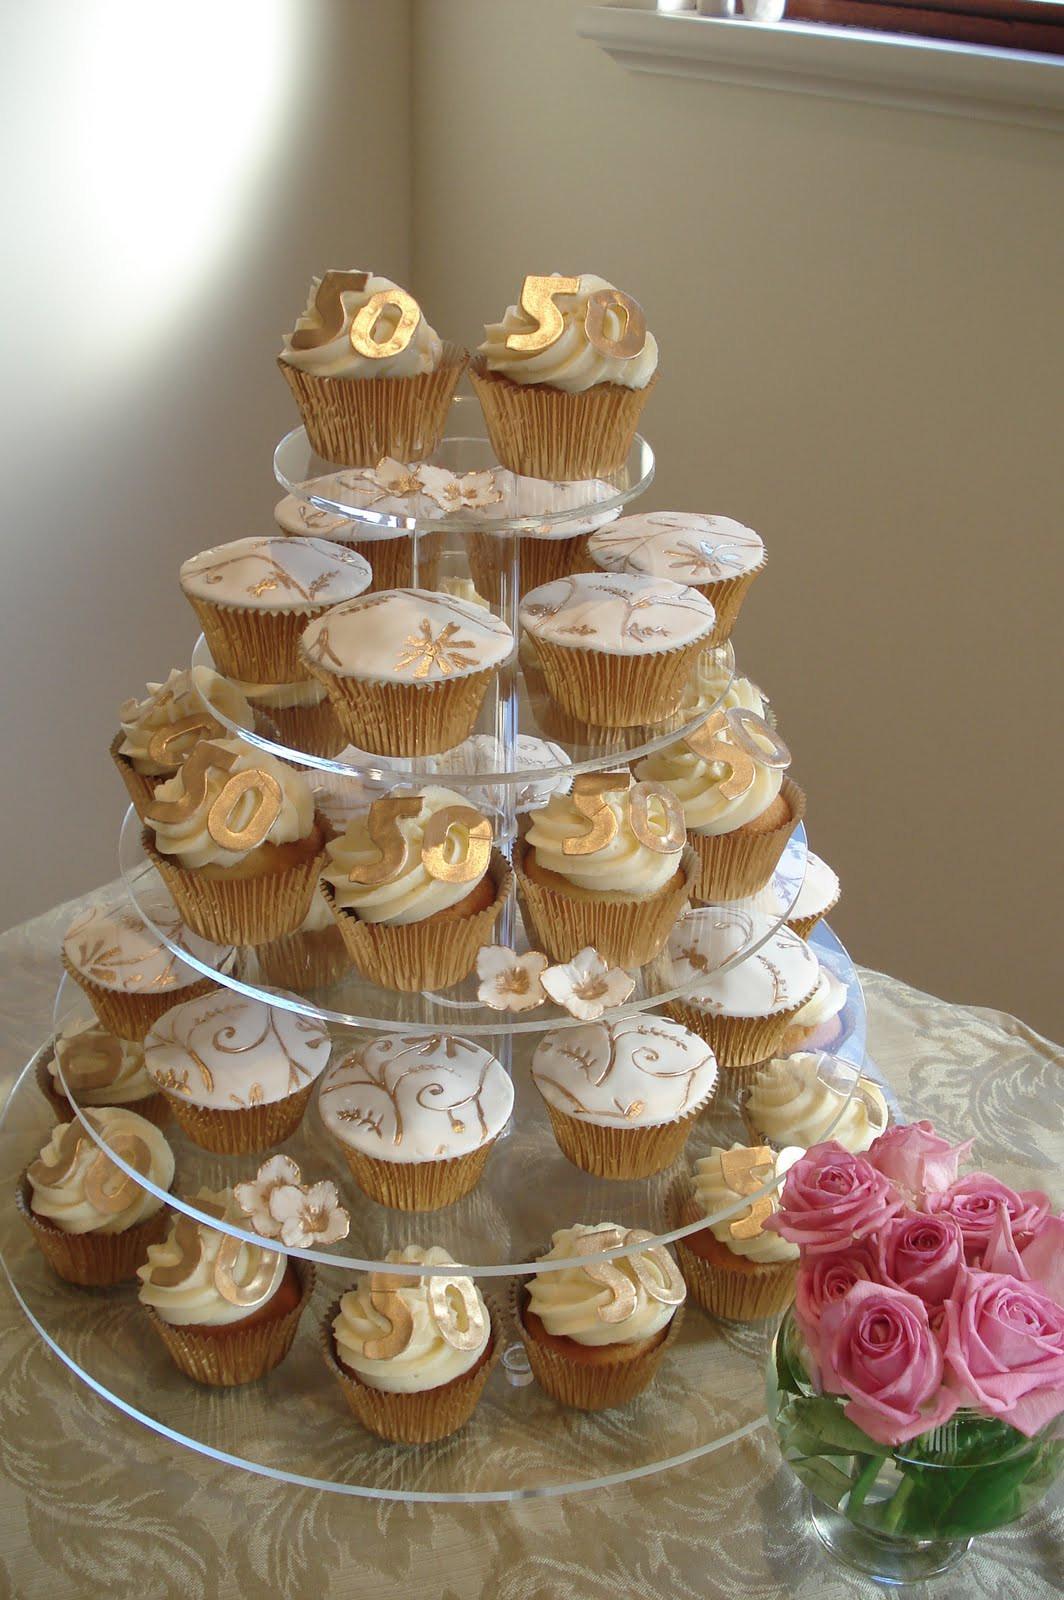 Wedding Anniversary Cupcakes Ideas  Wonderful World of Cupcakes Cupcakes for a 50th Wedding